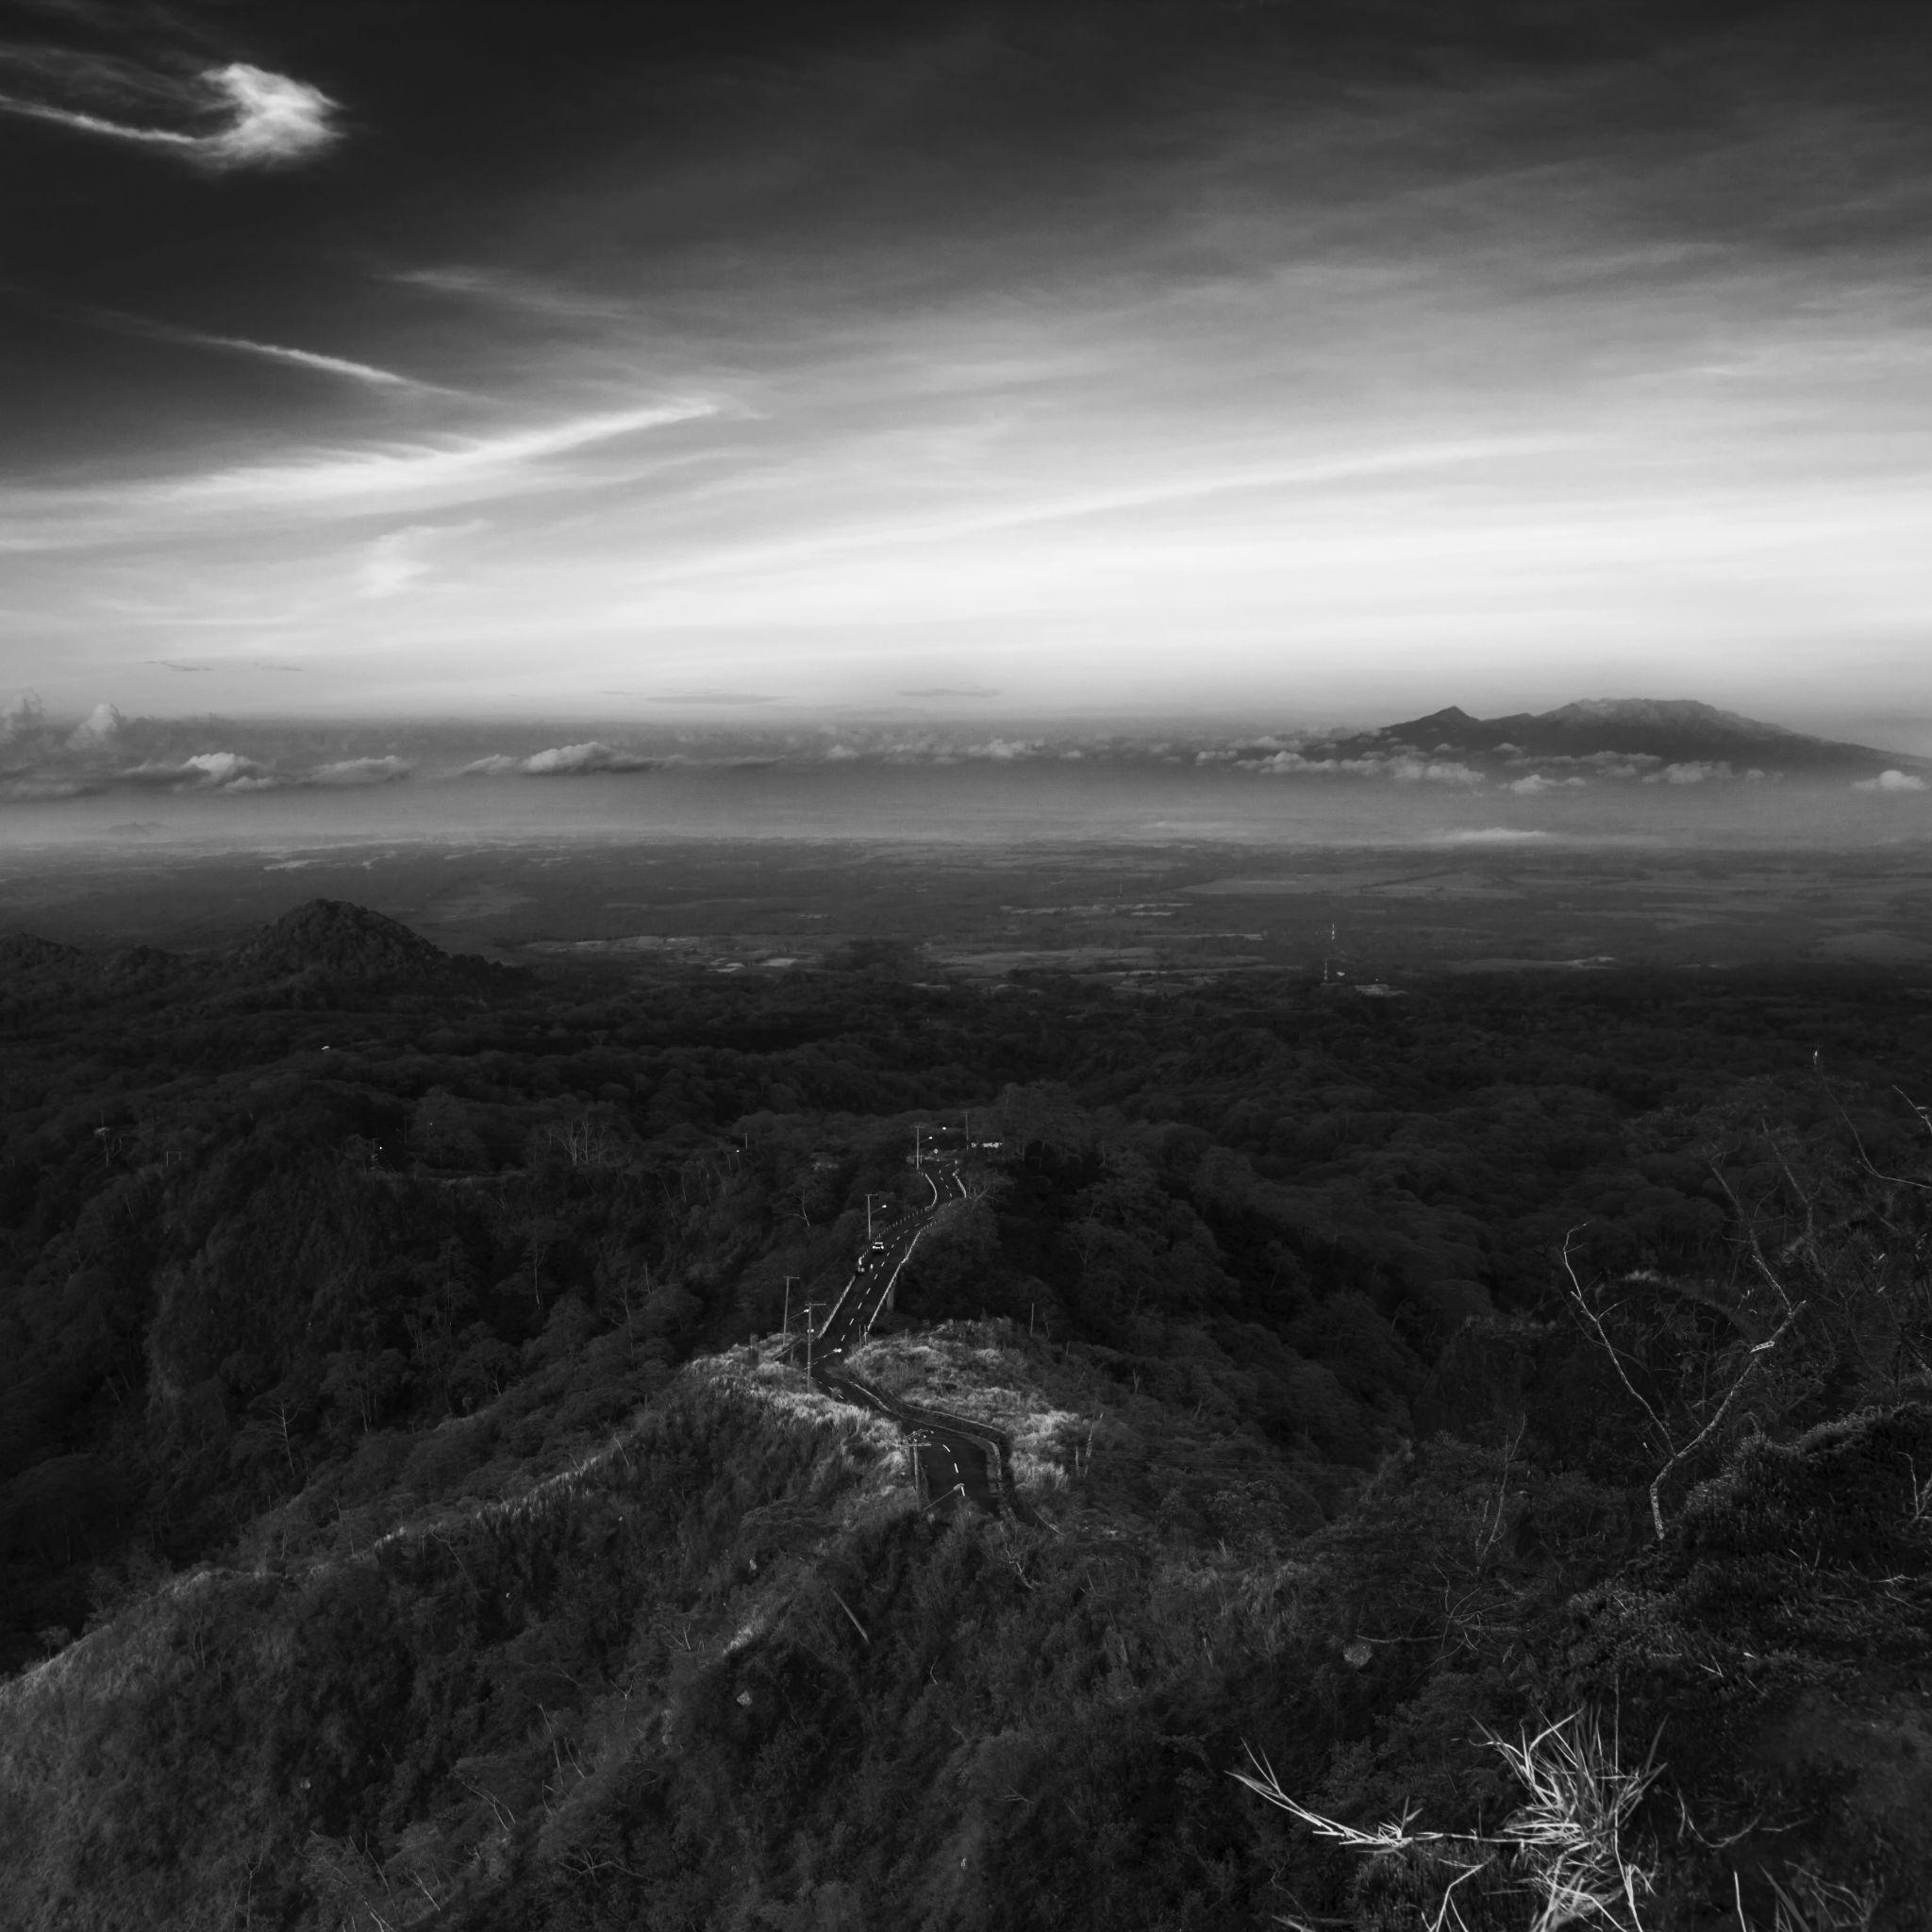 The Hill by Dika yudha rio p